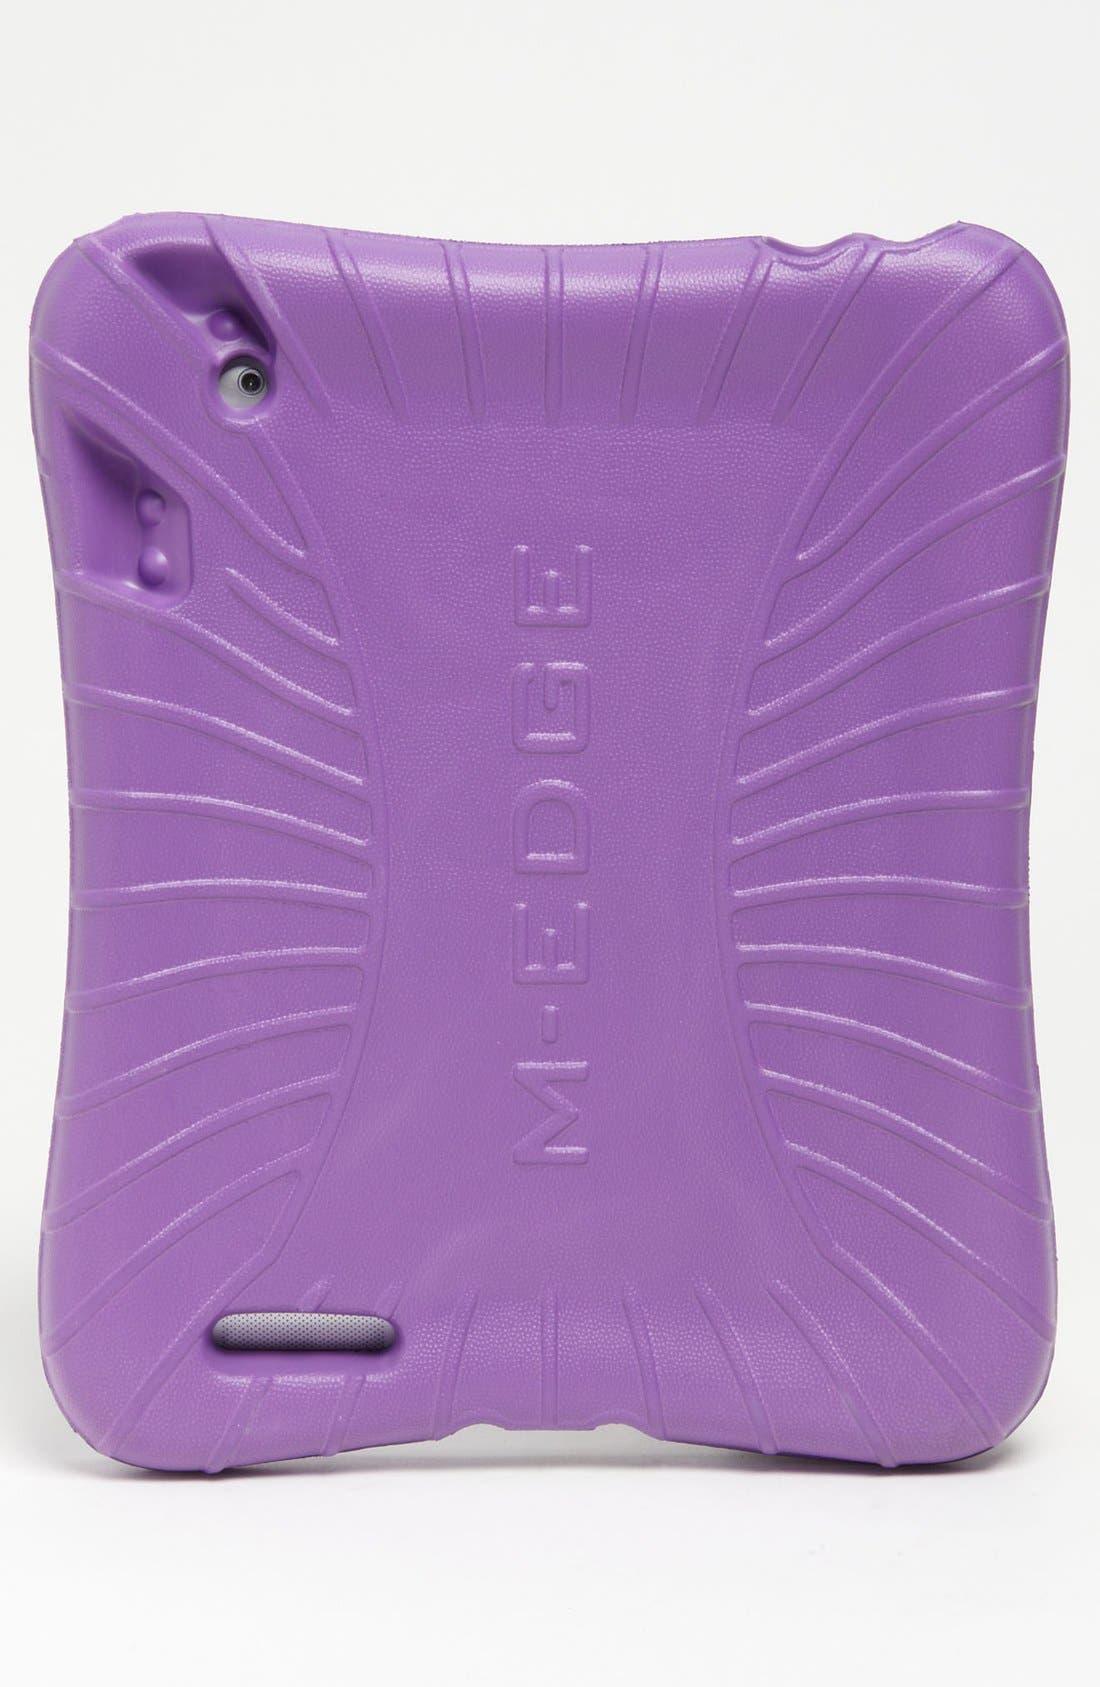 Alternate Image 2  - M-Edge 'iPad Super Shell' Protective iPad 2 & 3 Case